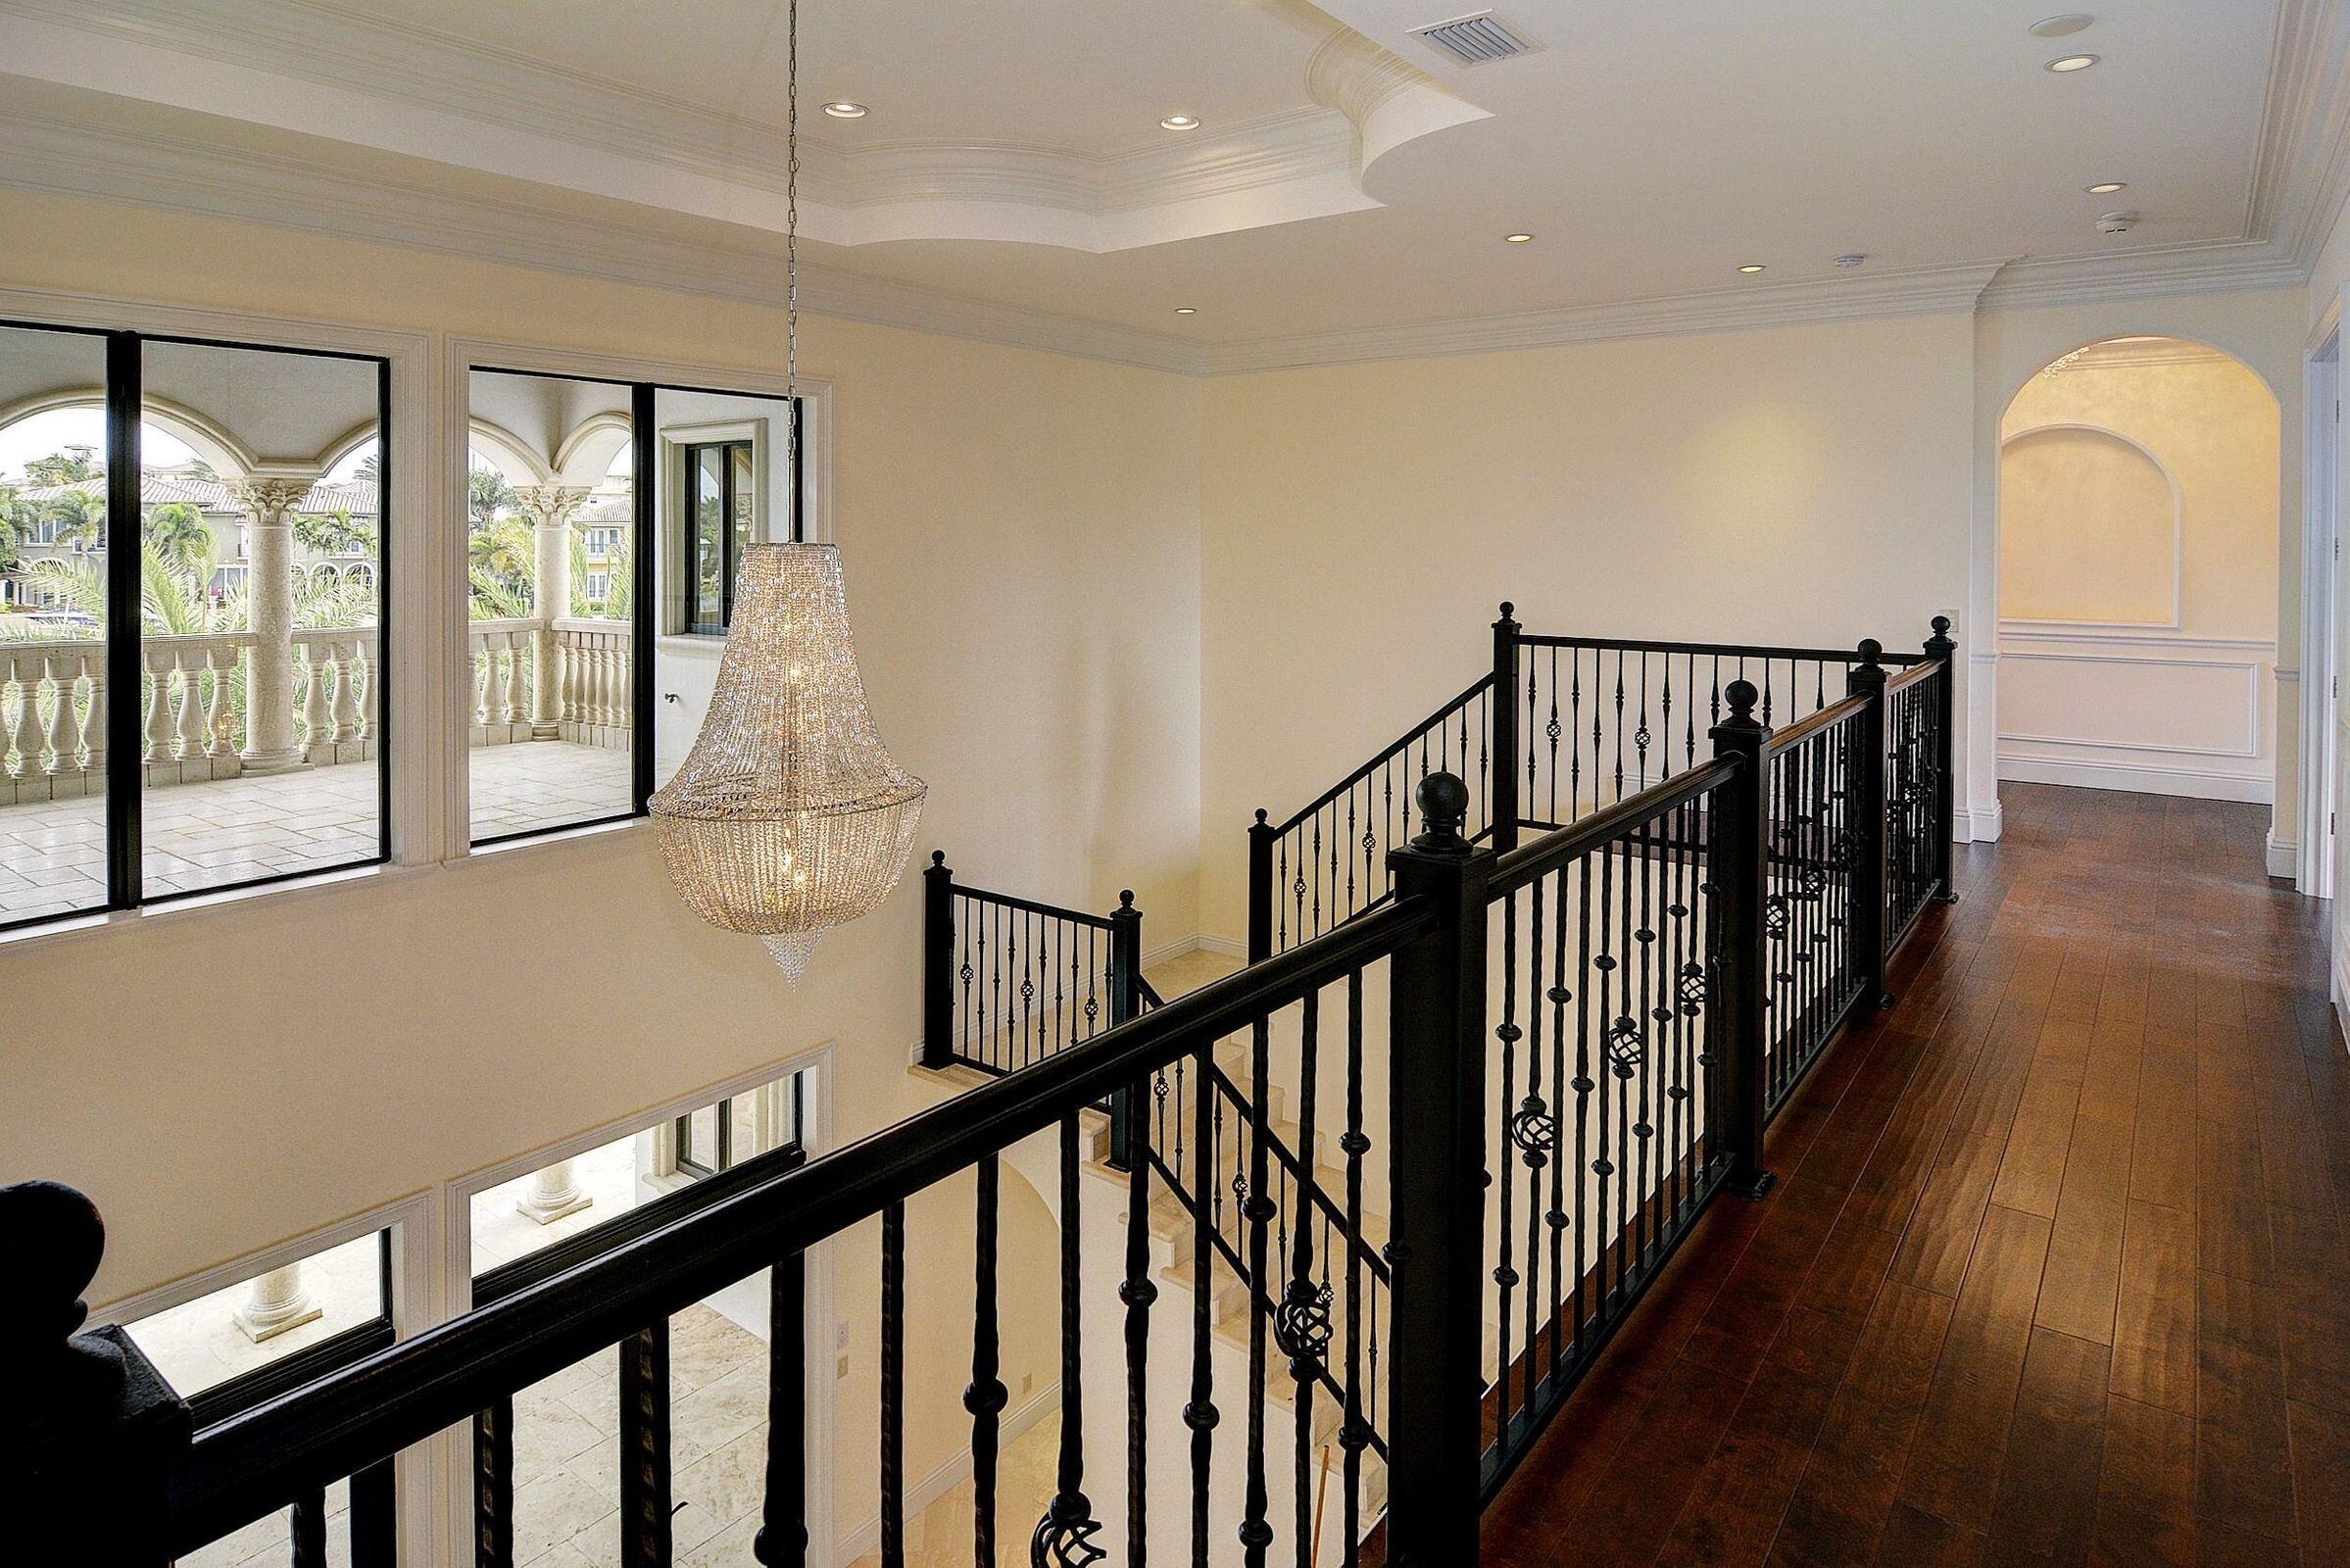 961 Jasmine Drive, Delray Beach, Florida 33483, 5 Bedrooms Bedrooms, ,6.1 BathroomsBathrooms,Single Family Detached,For Sale,Jasmine,RX-10746804